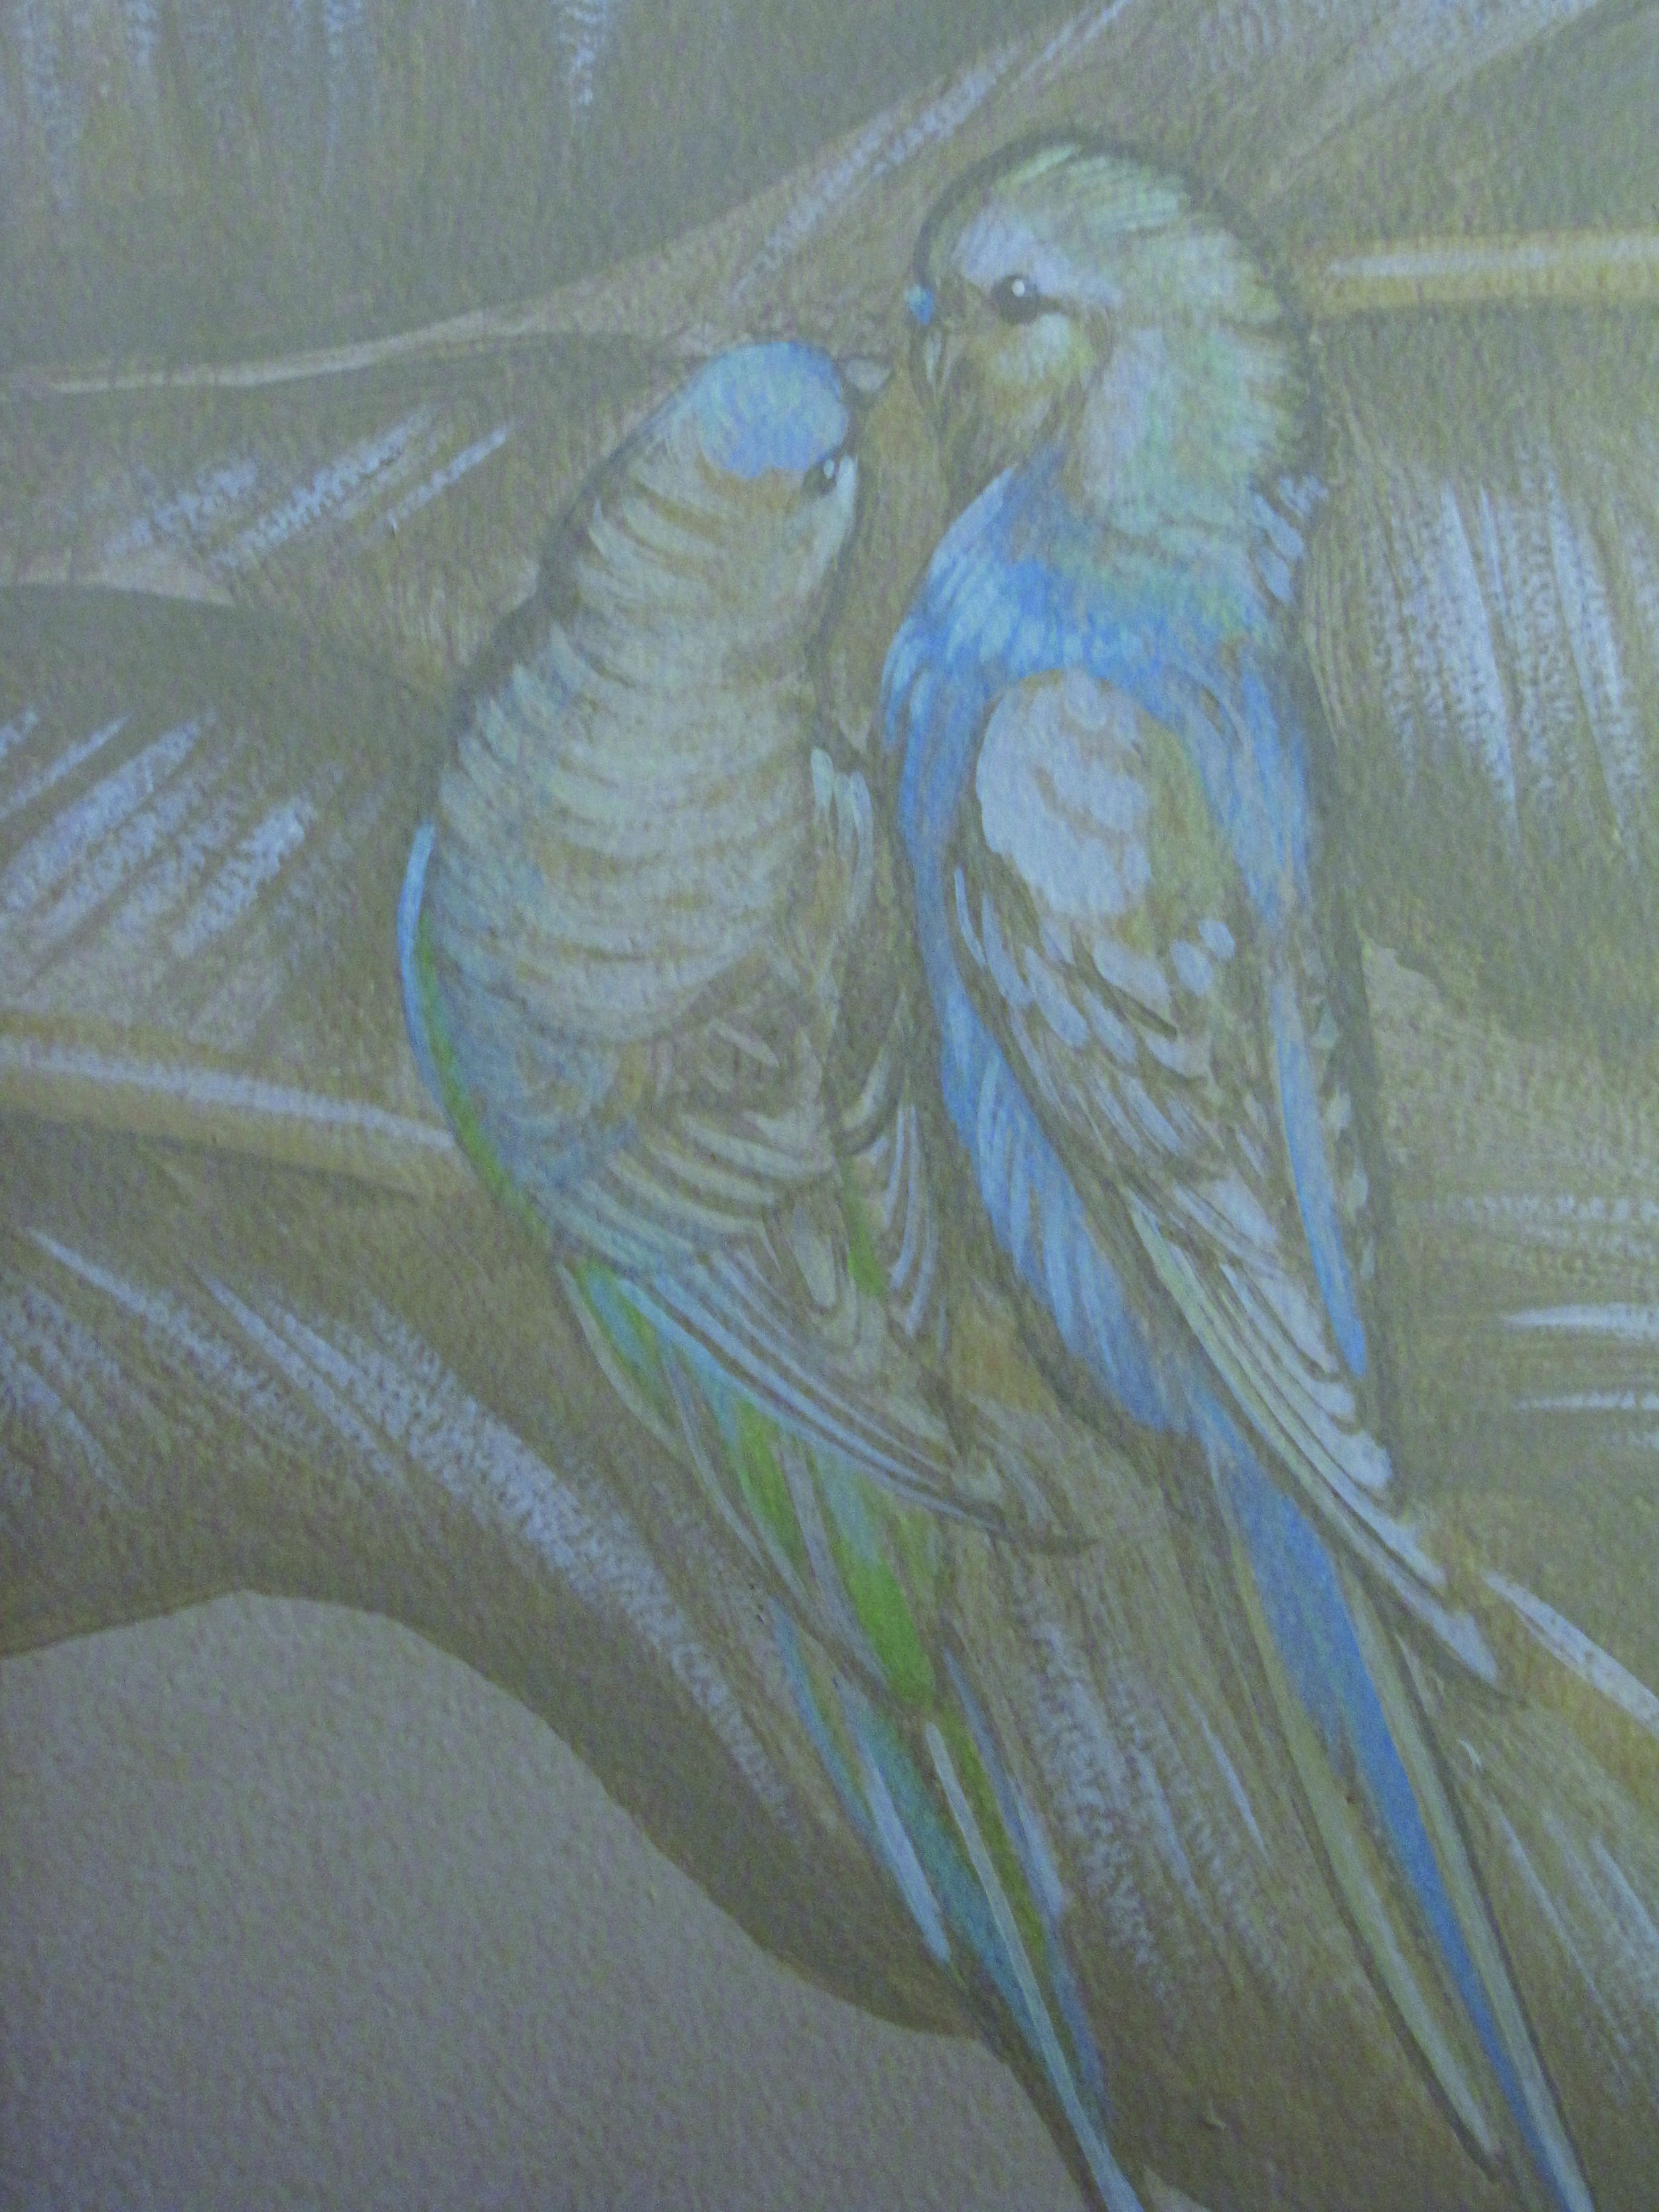 parakeetcouple.jpg